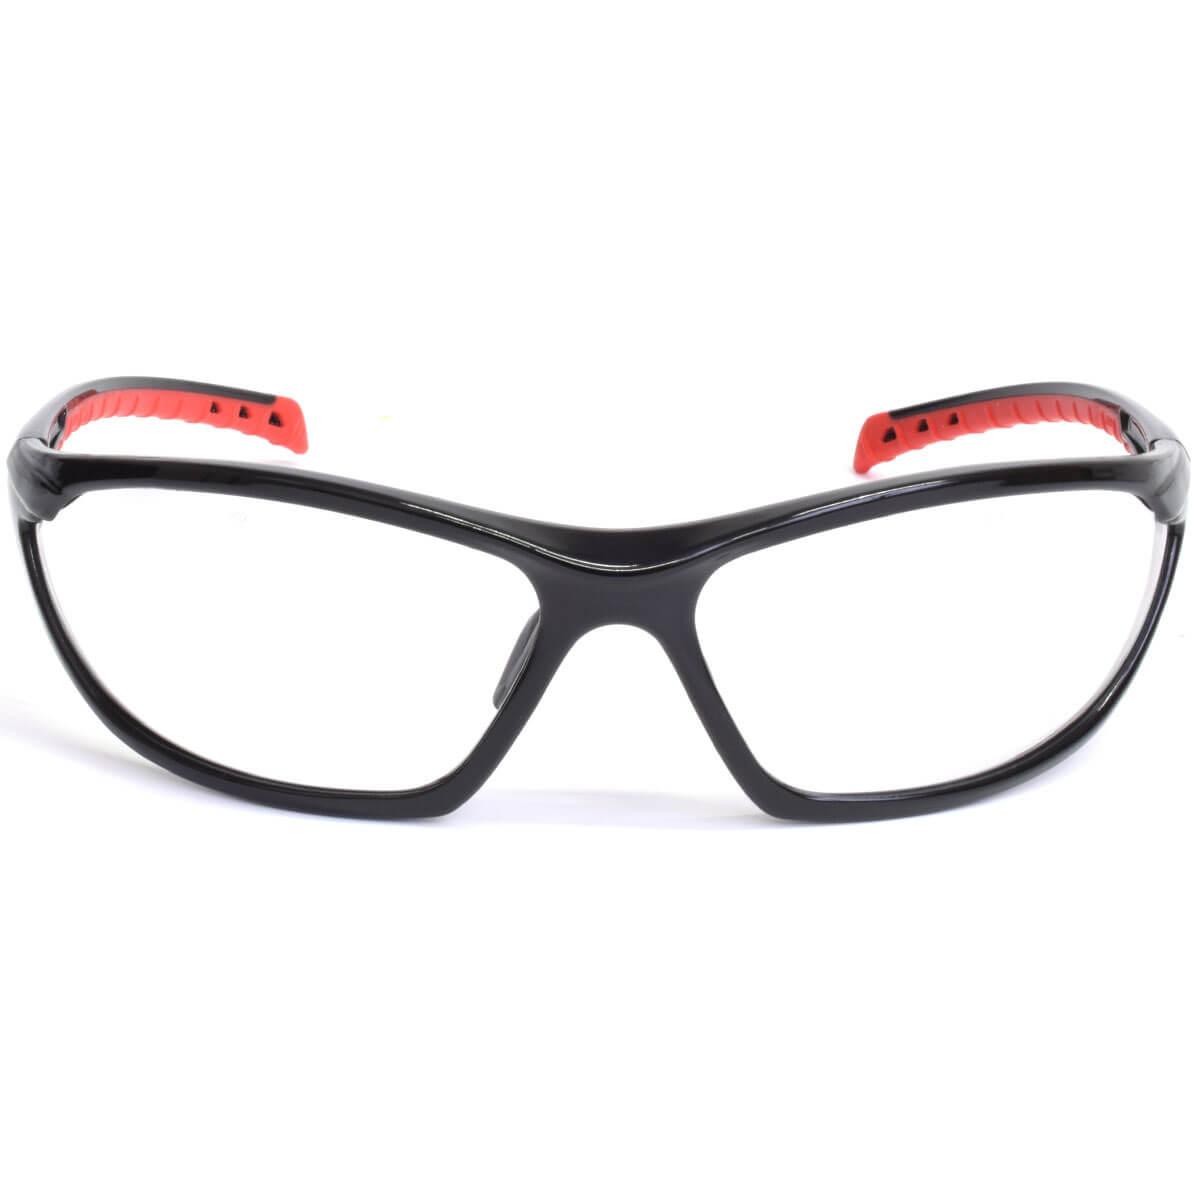 efbeceac9ce83 Óculos de Segurança Lente Incolor Spark Steel Pro VIC58910 Vicsa